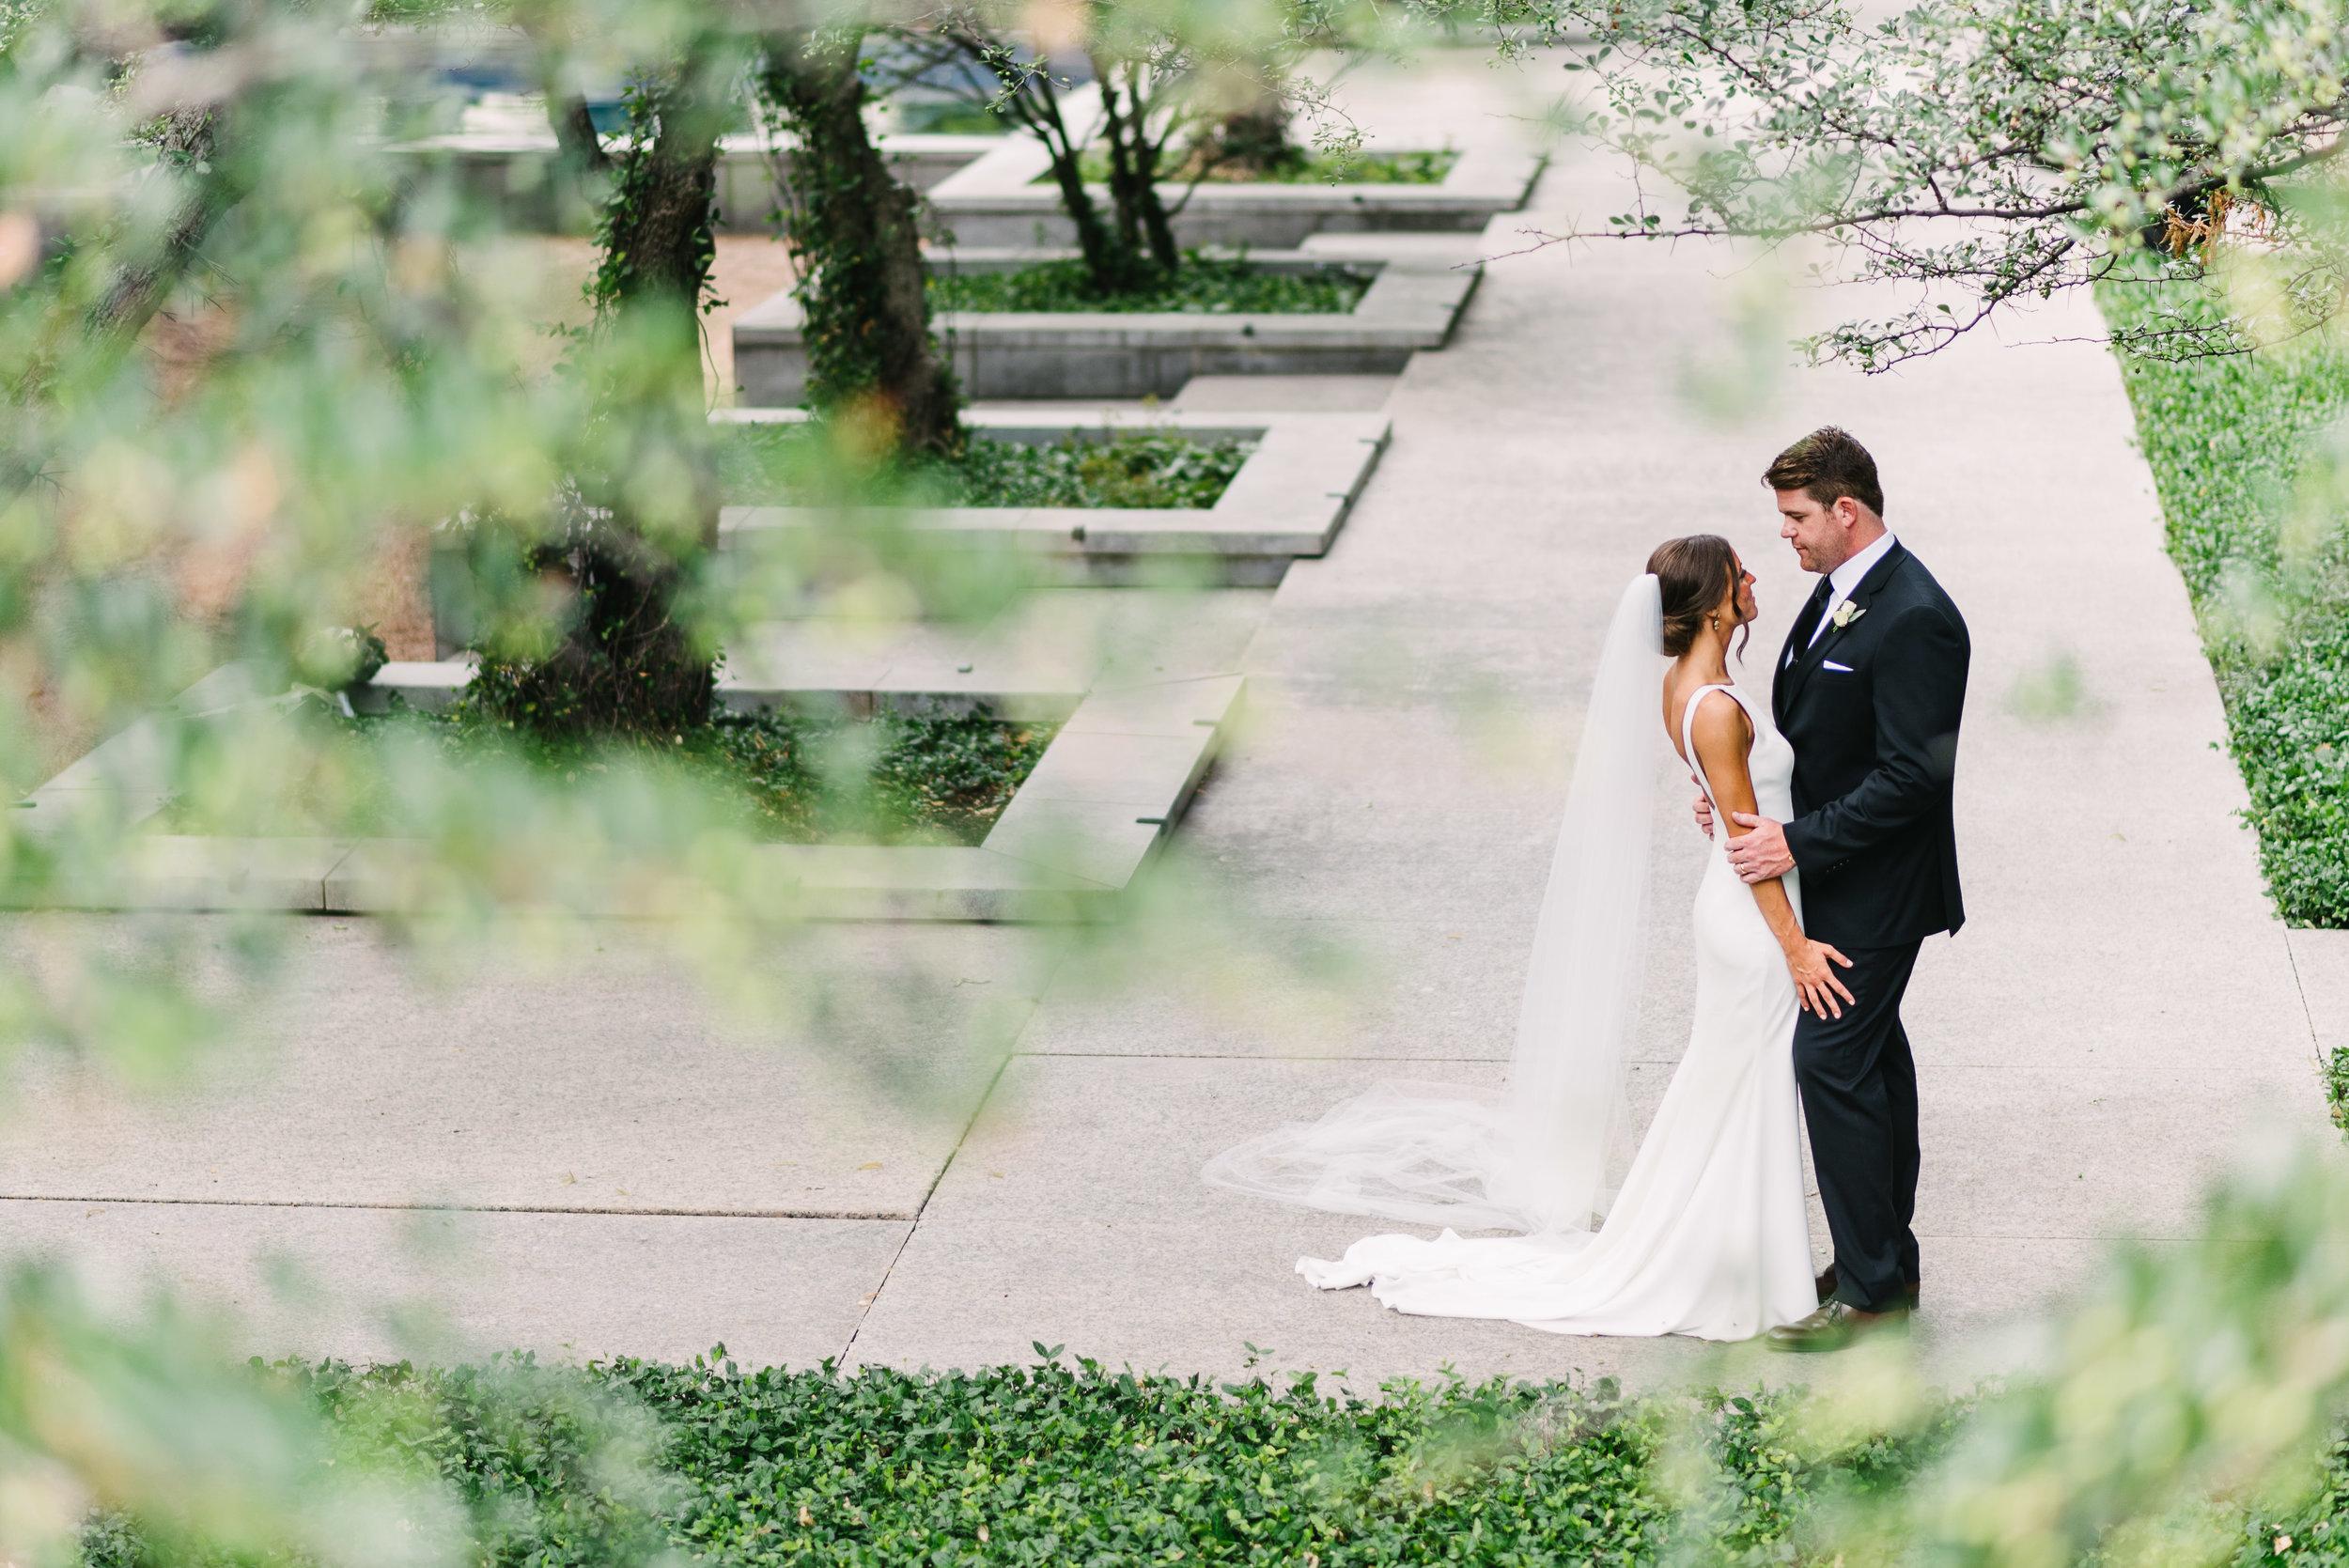 michelle-kyle-wedding_TSP-175105.jpg